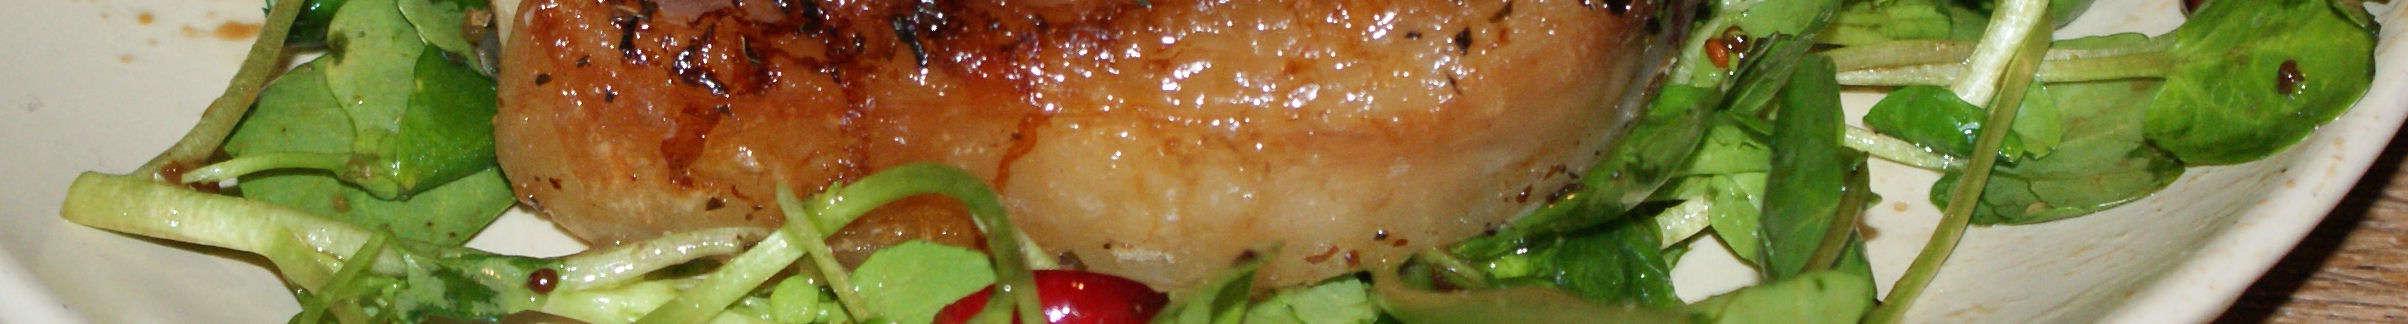 Frozen Lamb Chops Recipes | Yummly |Frozen Lamb Chops